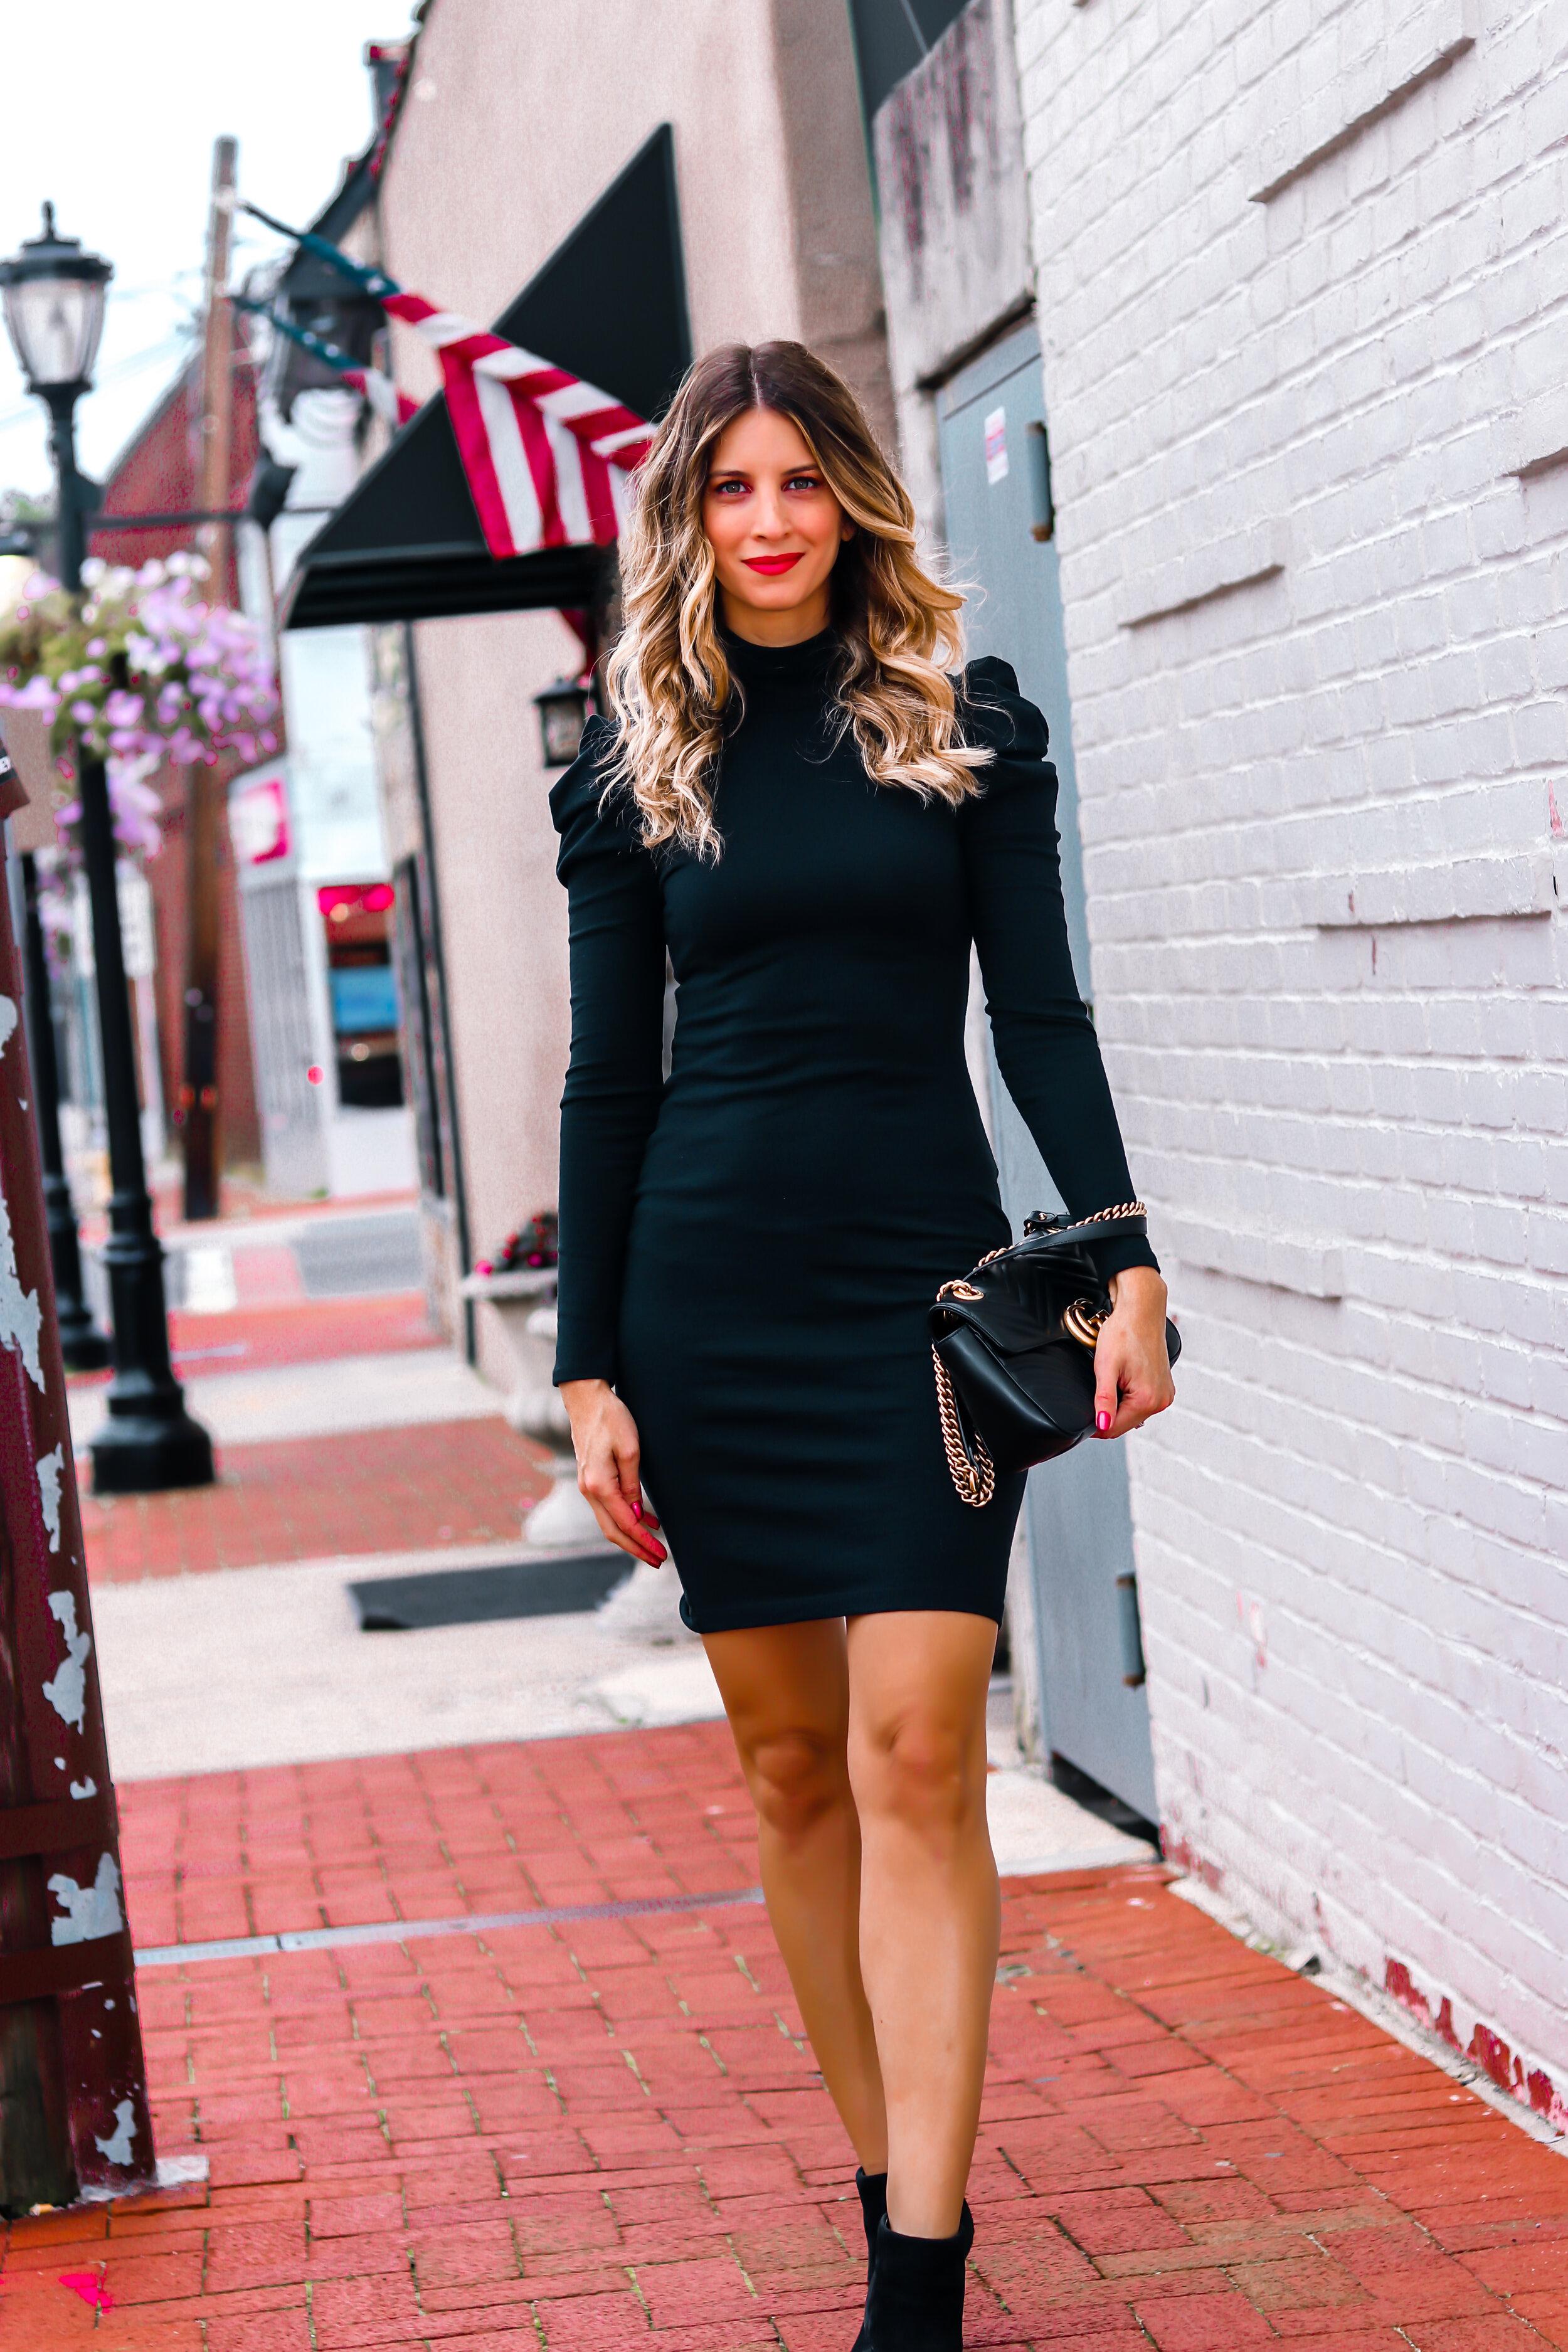 black dress + booties 4a.jpg